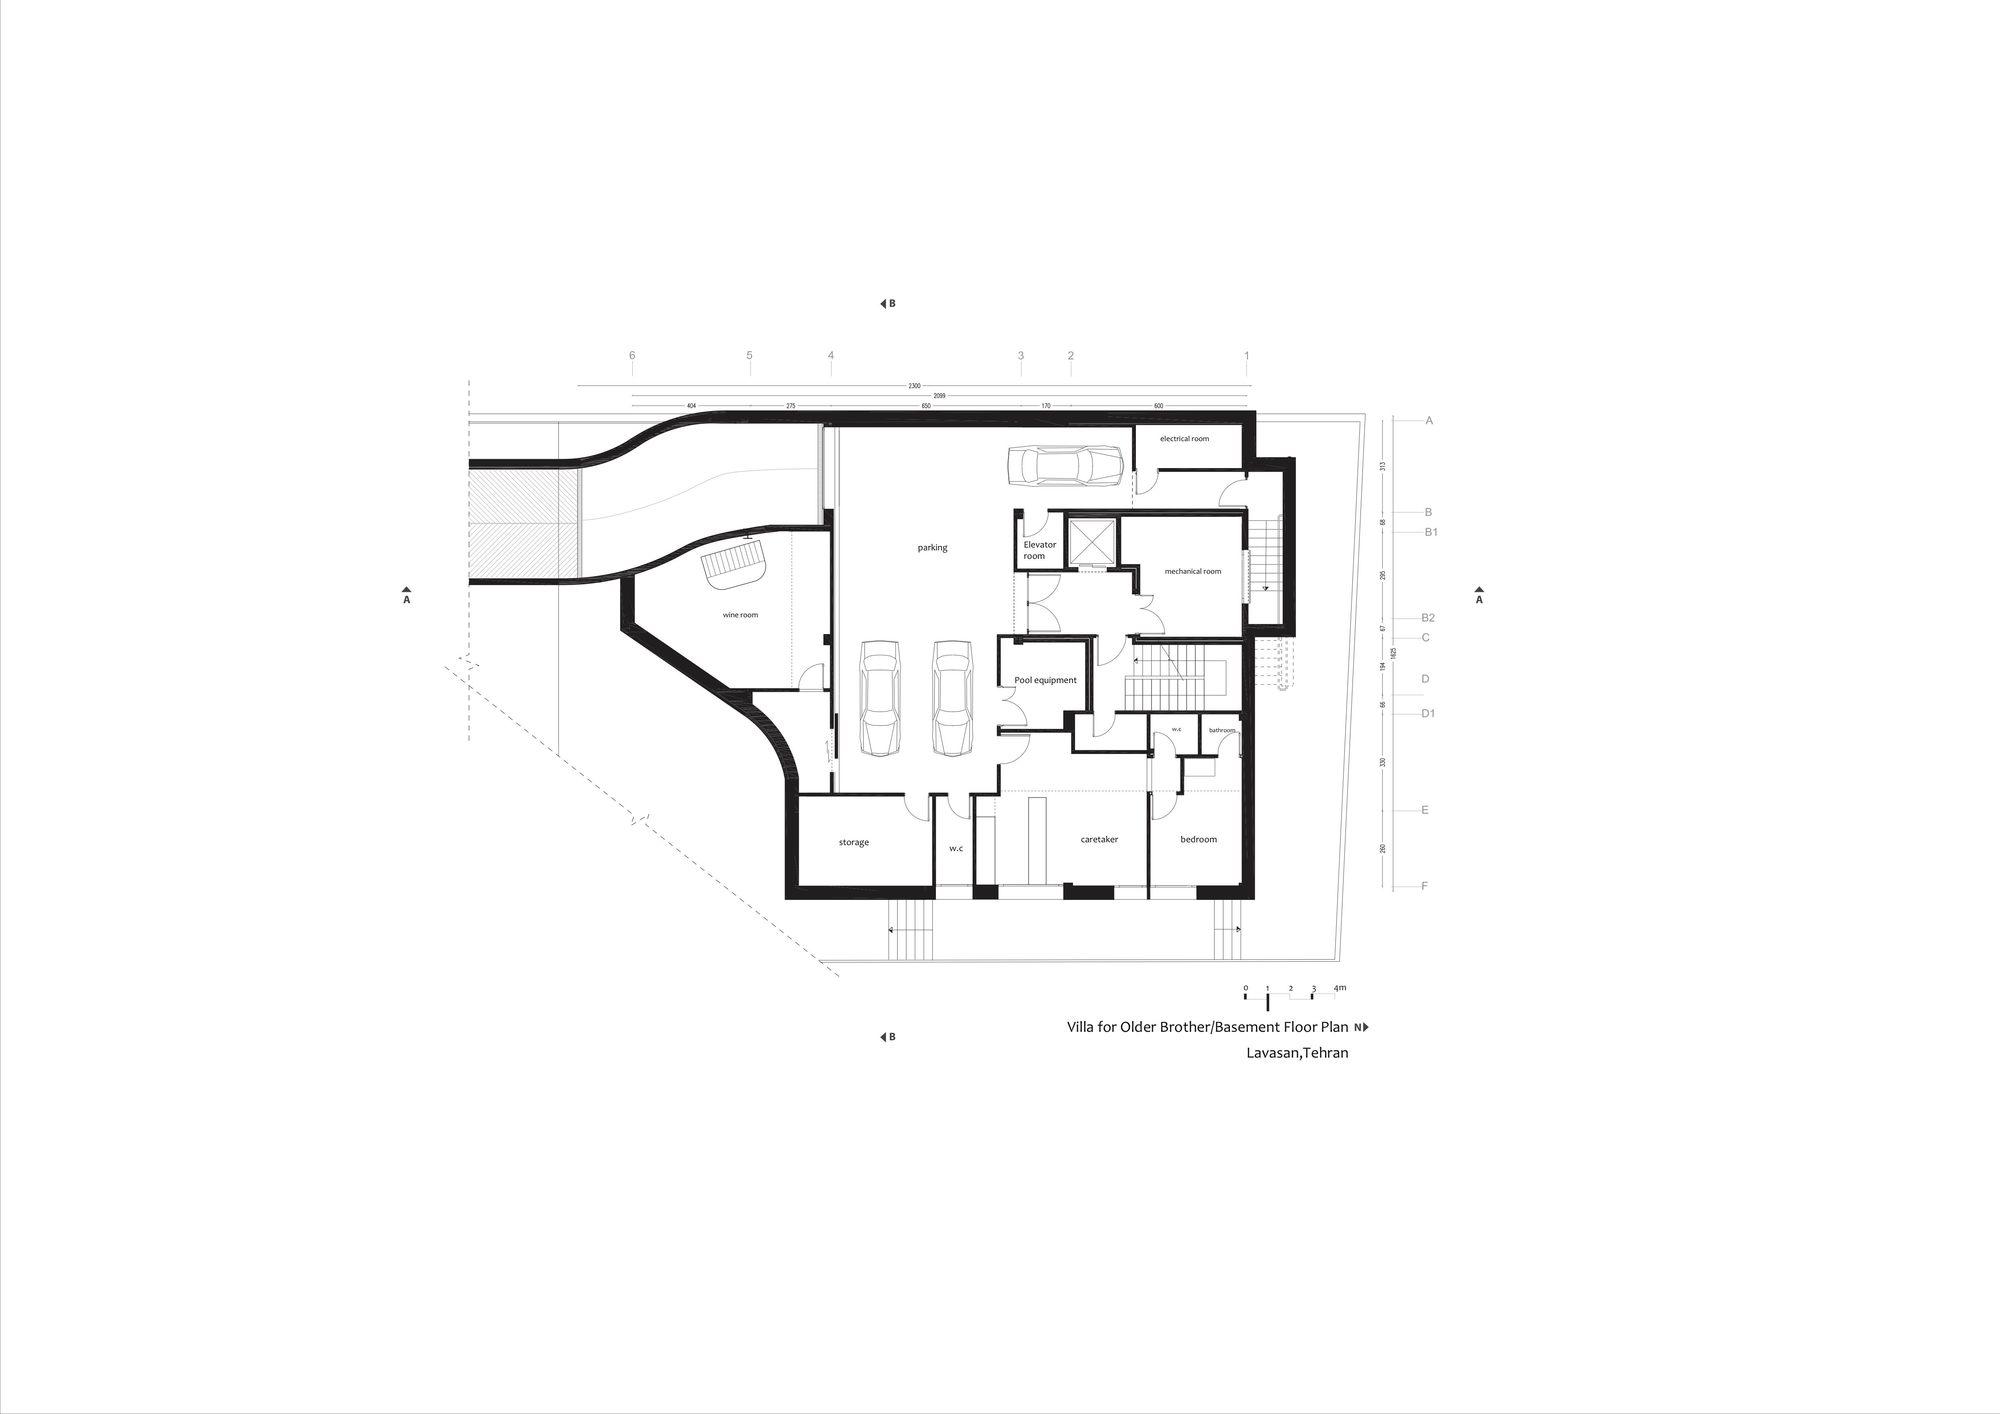 medium resolution of villa electrical plan